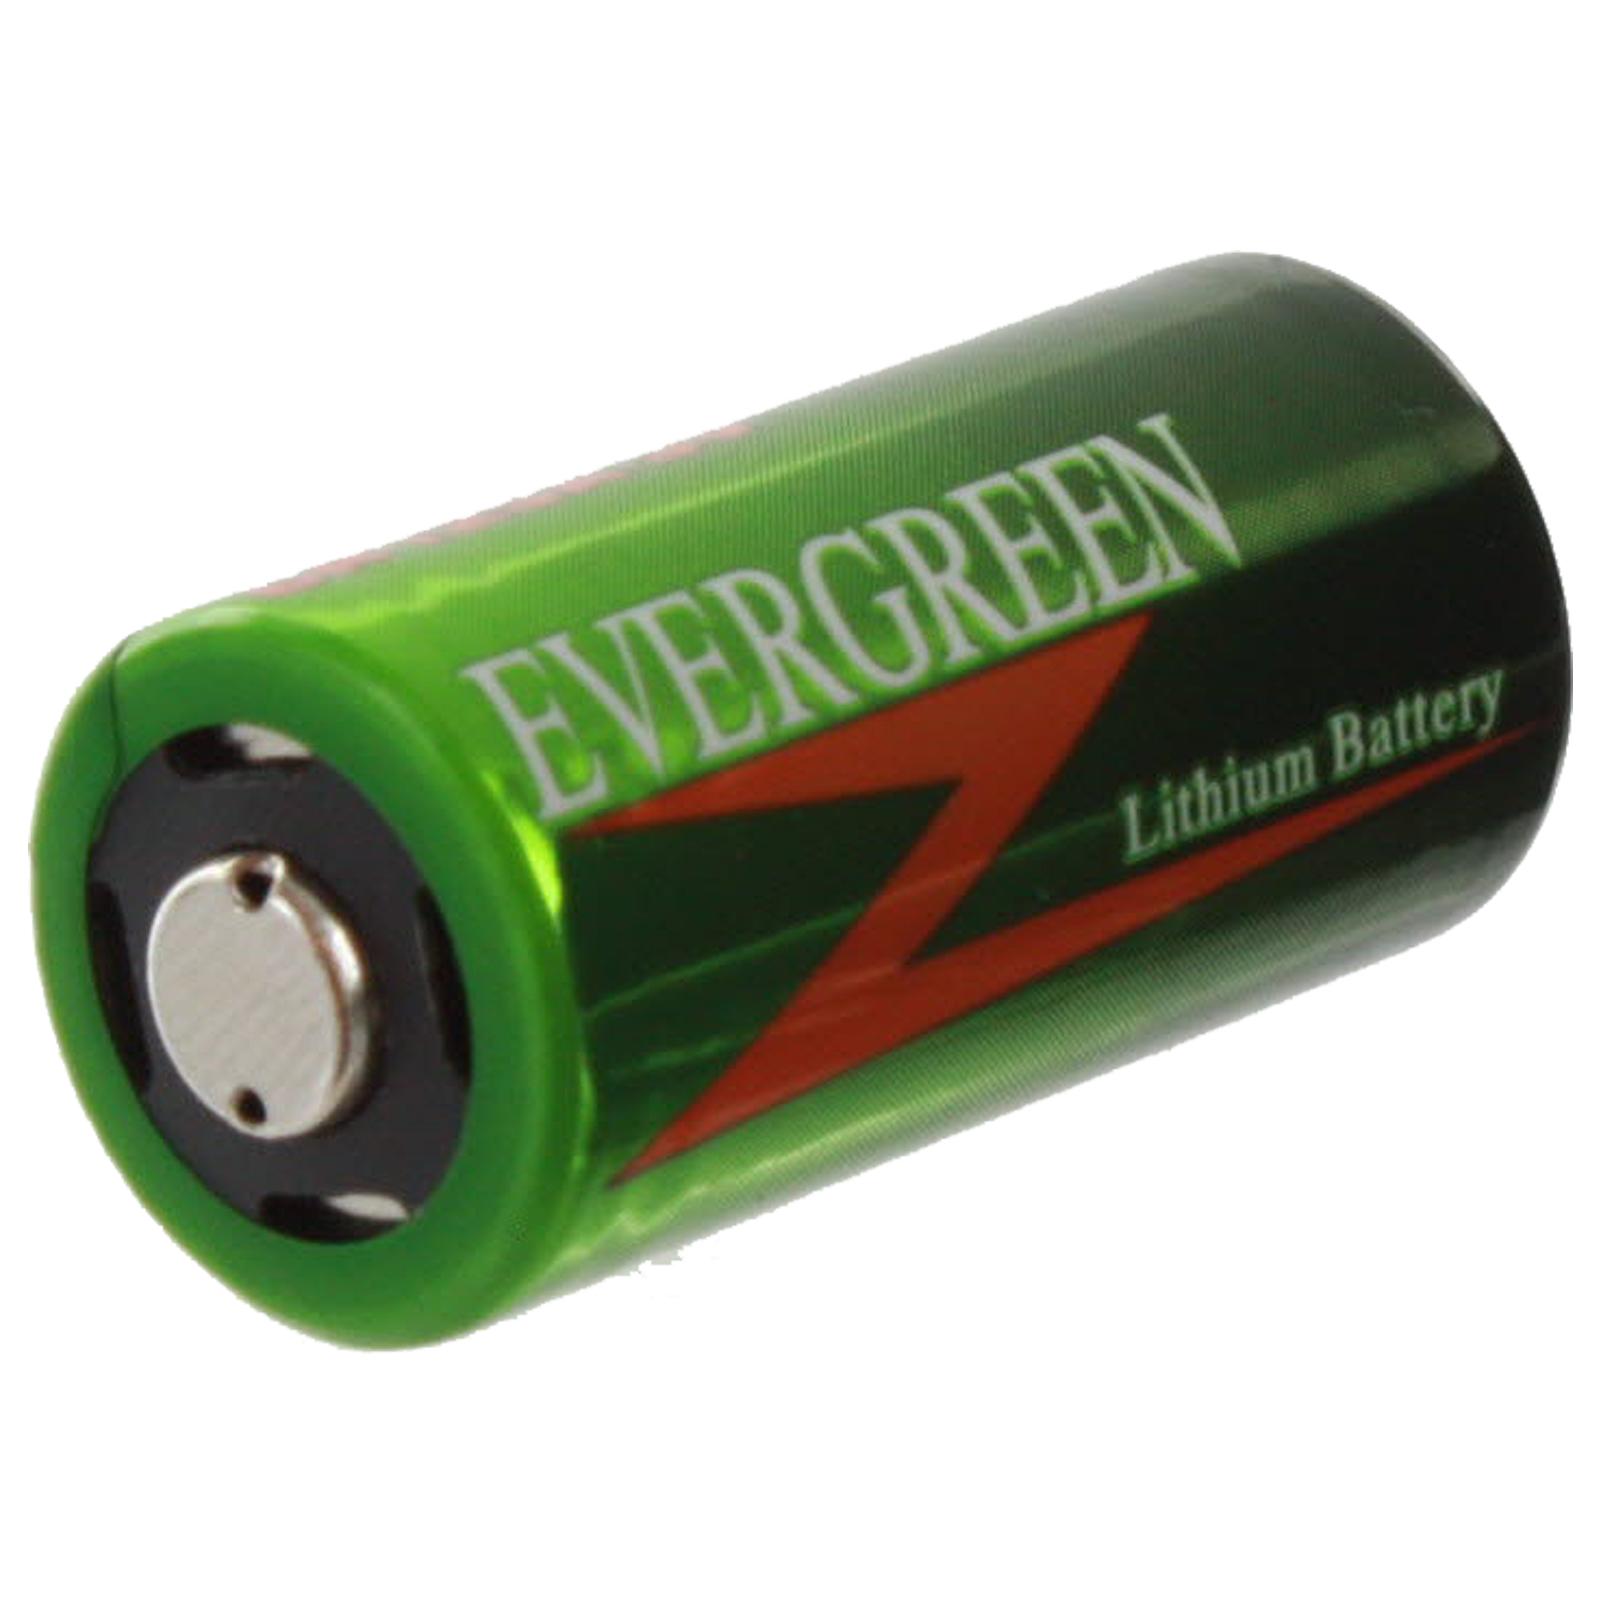 evergreen cr123 2 3a photo lithium battery replaces dl123 k123 el123 usa ship 26190211385 ebay. Black Bedroom Furniture Sets. Home Design Ideas